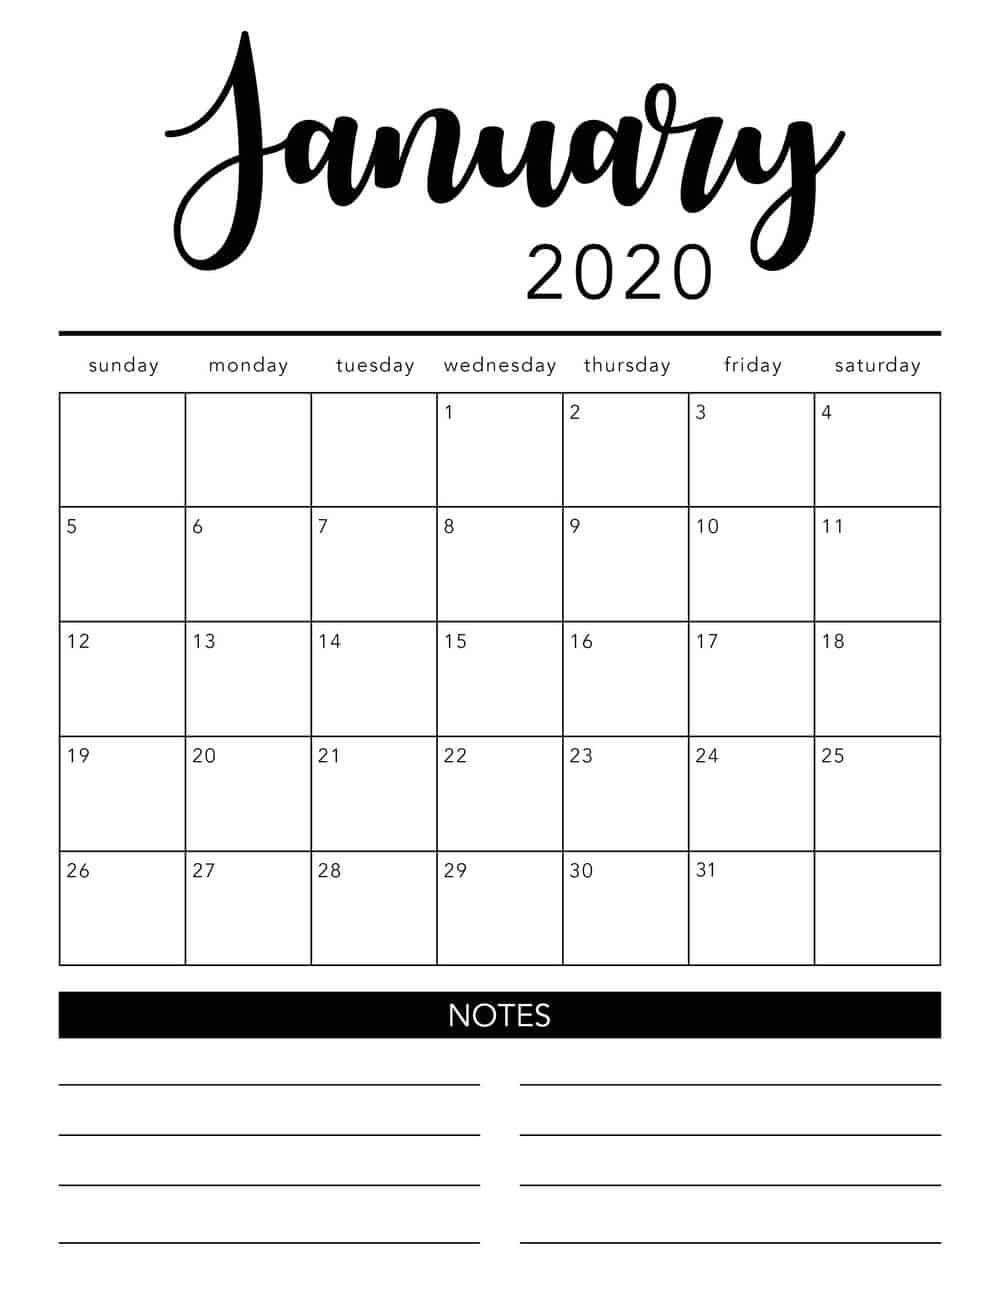 FREE 2020 Printable Calendar Template 2 colors I